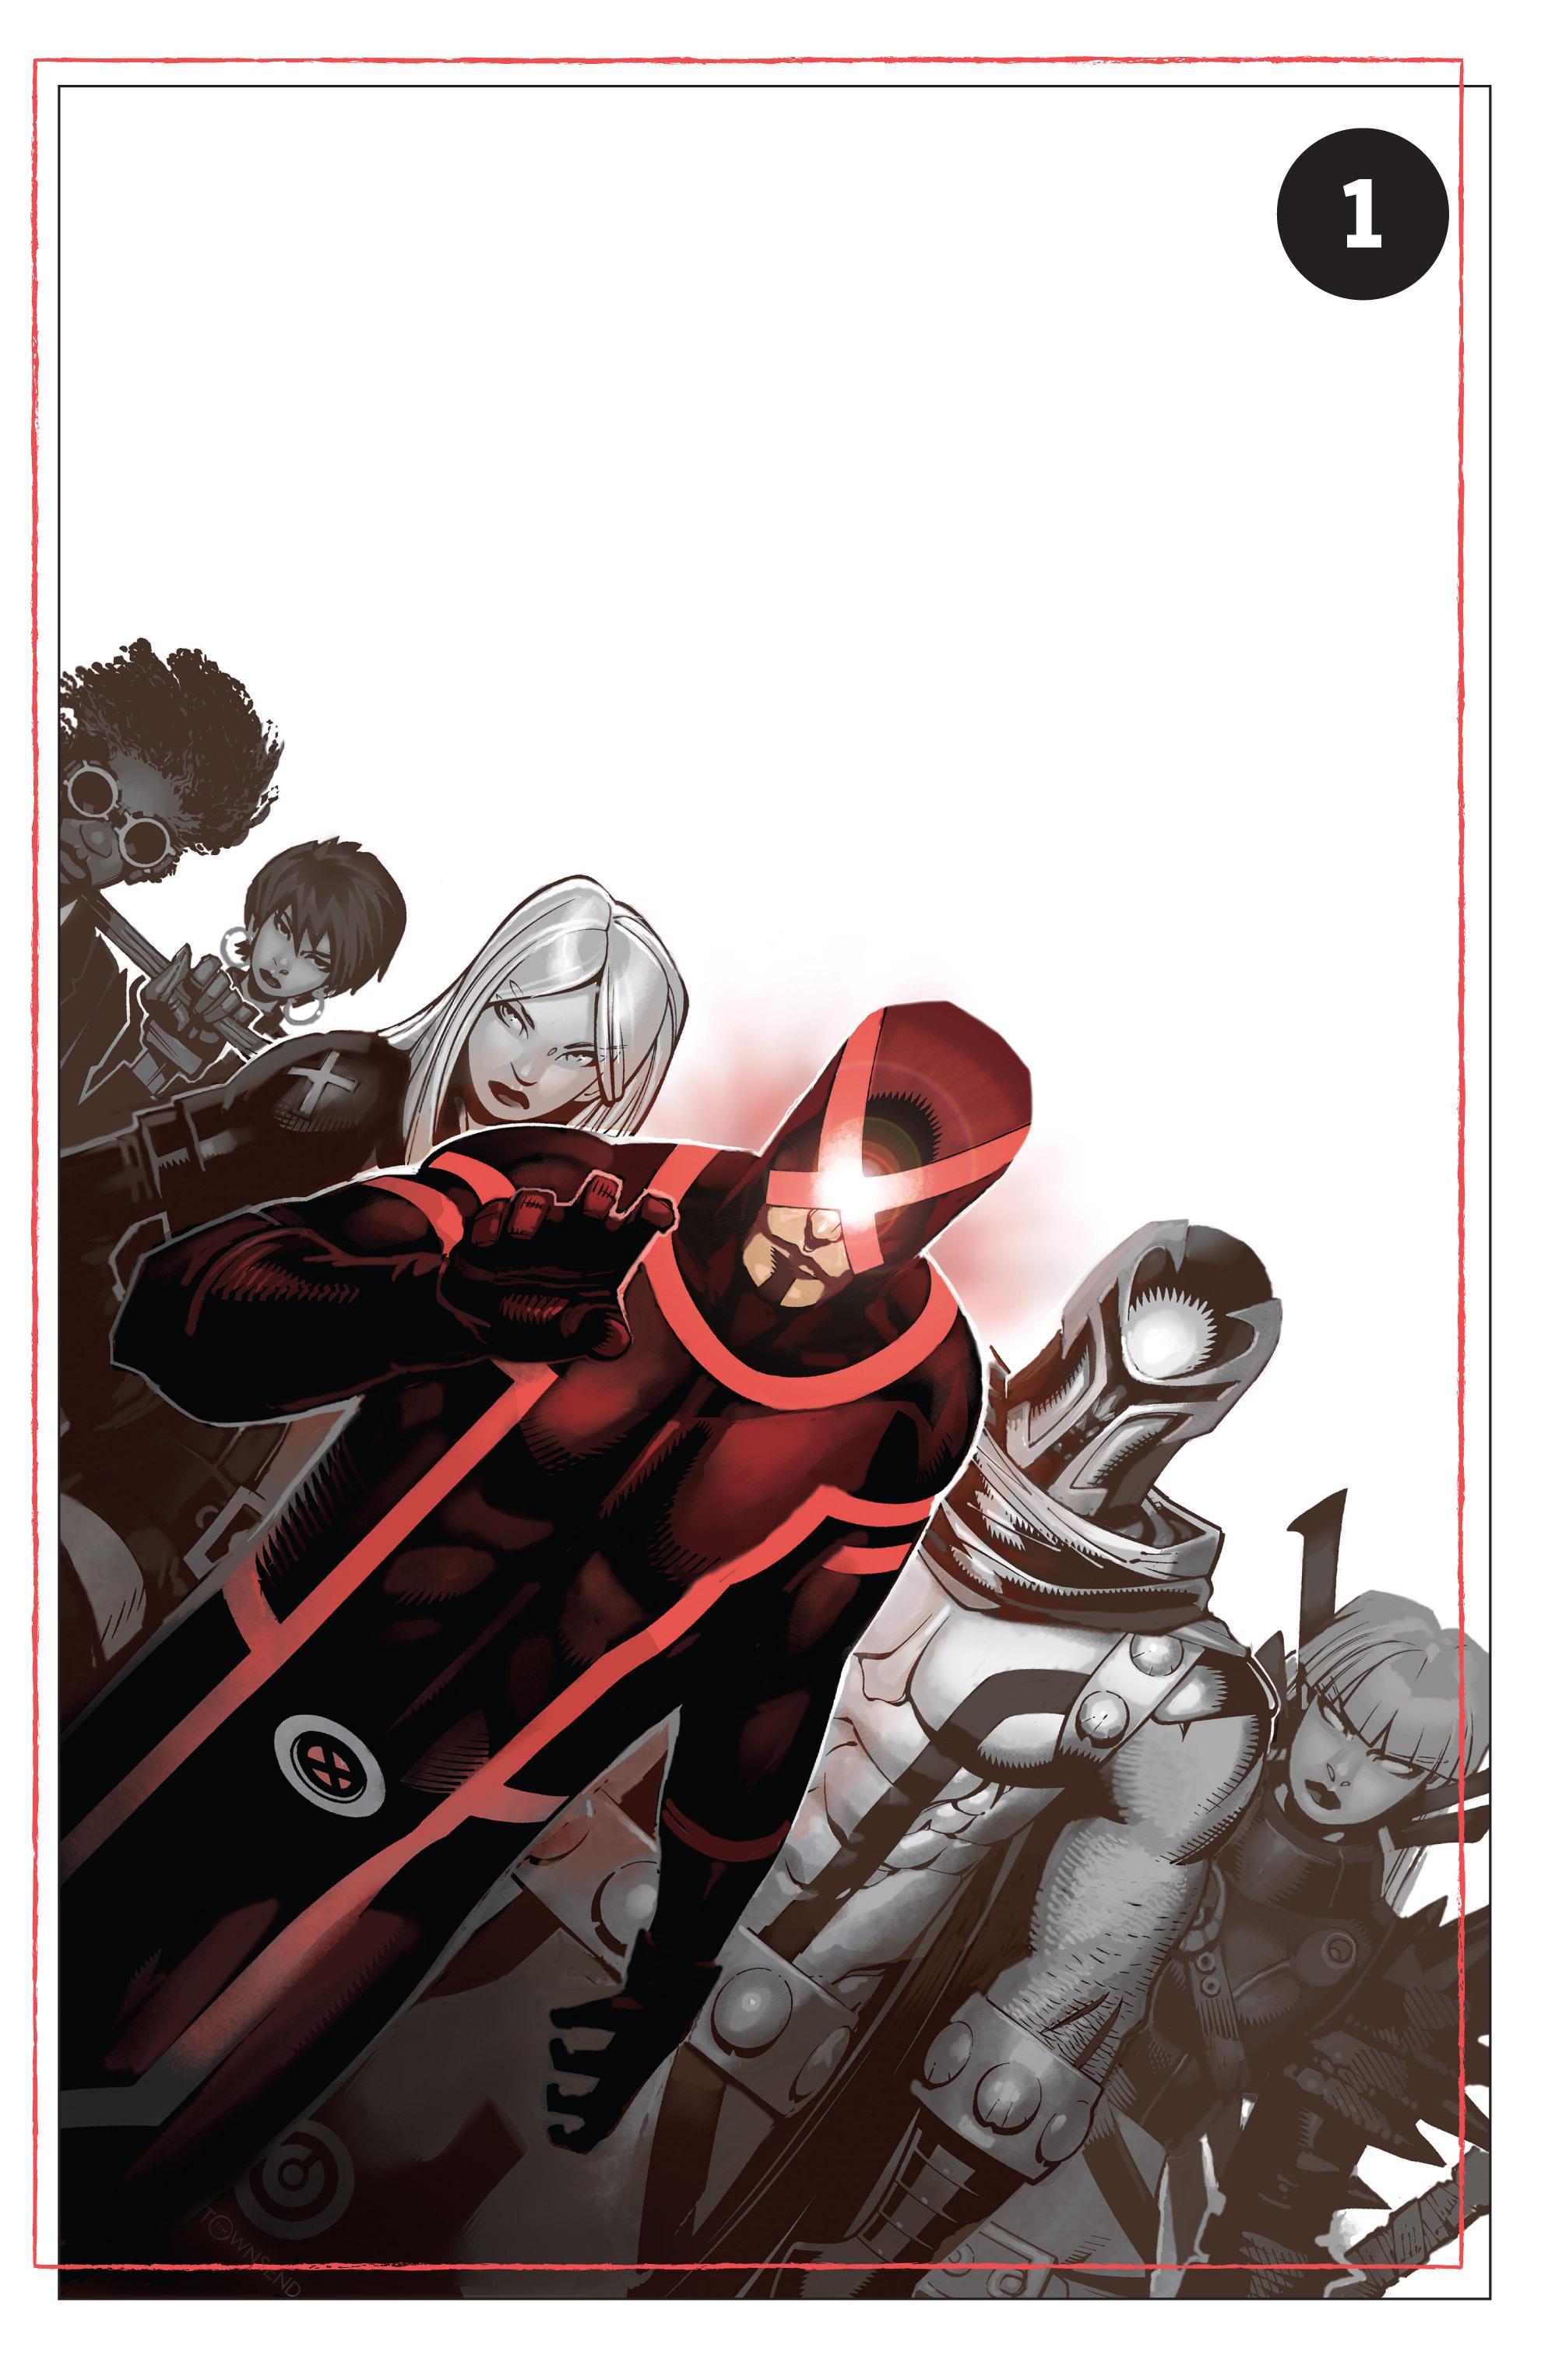 Read online Uncanny X-Men (2013) comic -  Issue # _TPB 1 - Revolution - 109